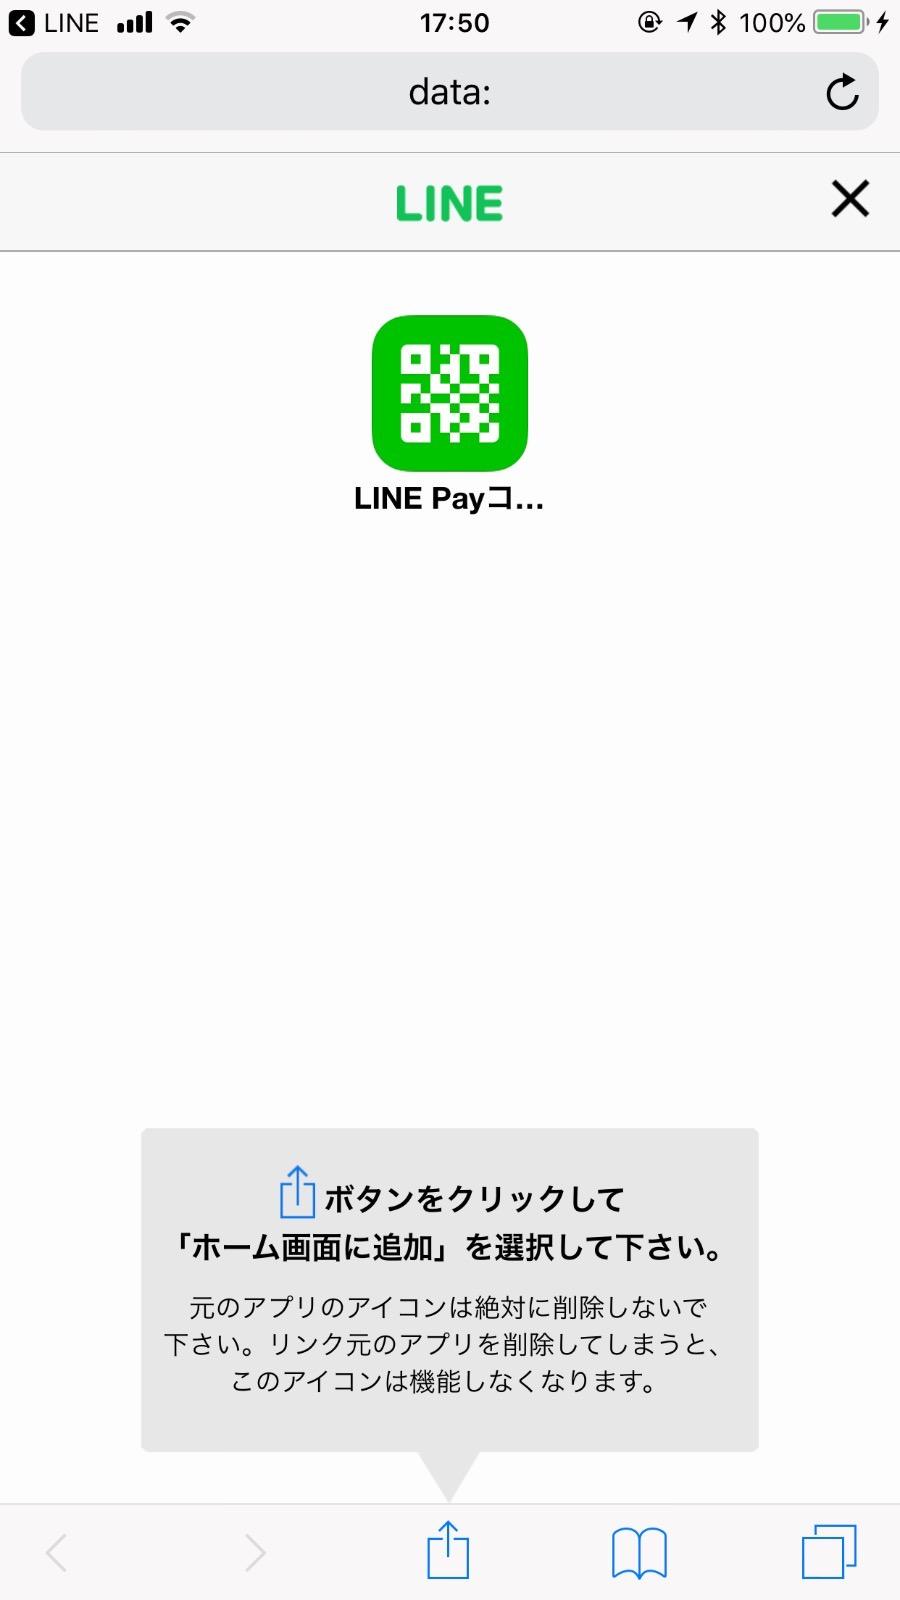 LINE Pay コード支払い ショートカット 作成方法